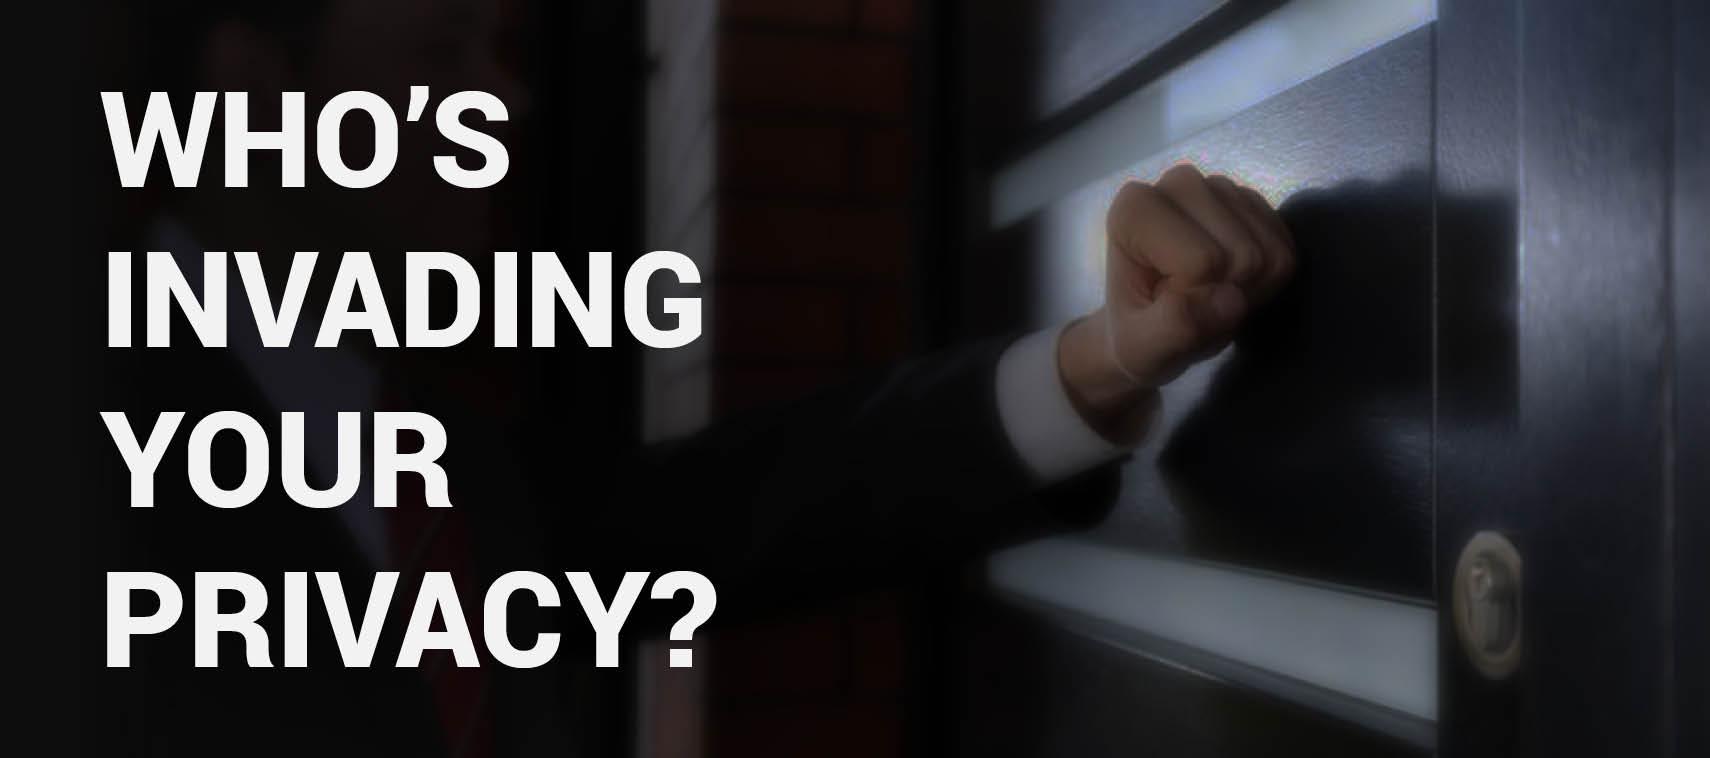 FF_invading_privacy.jpg